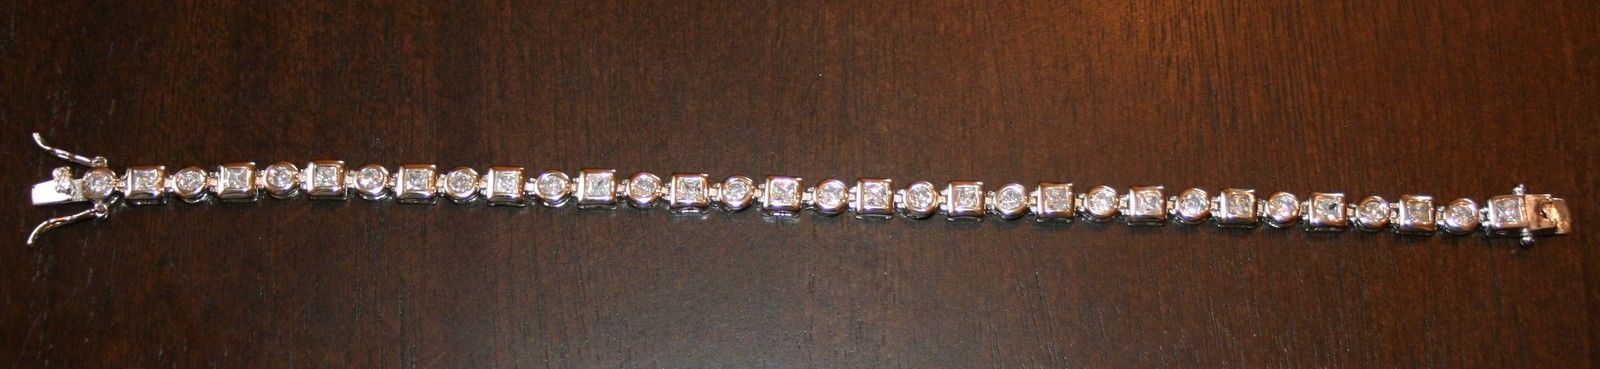 0.50ctw Genuine Diamond San Marco Design Bracelet 14k White Gold over 925 SS